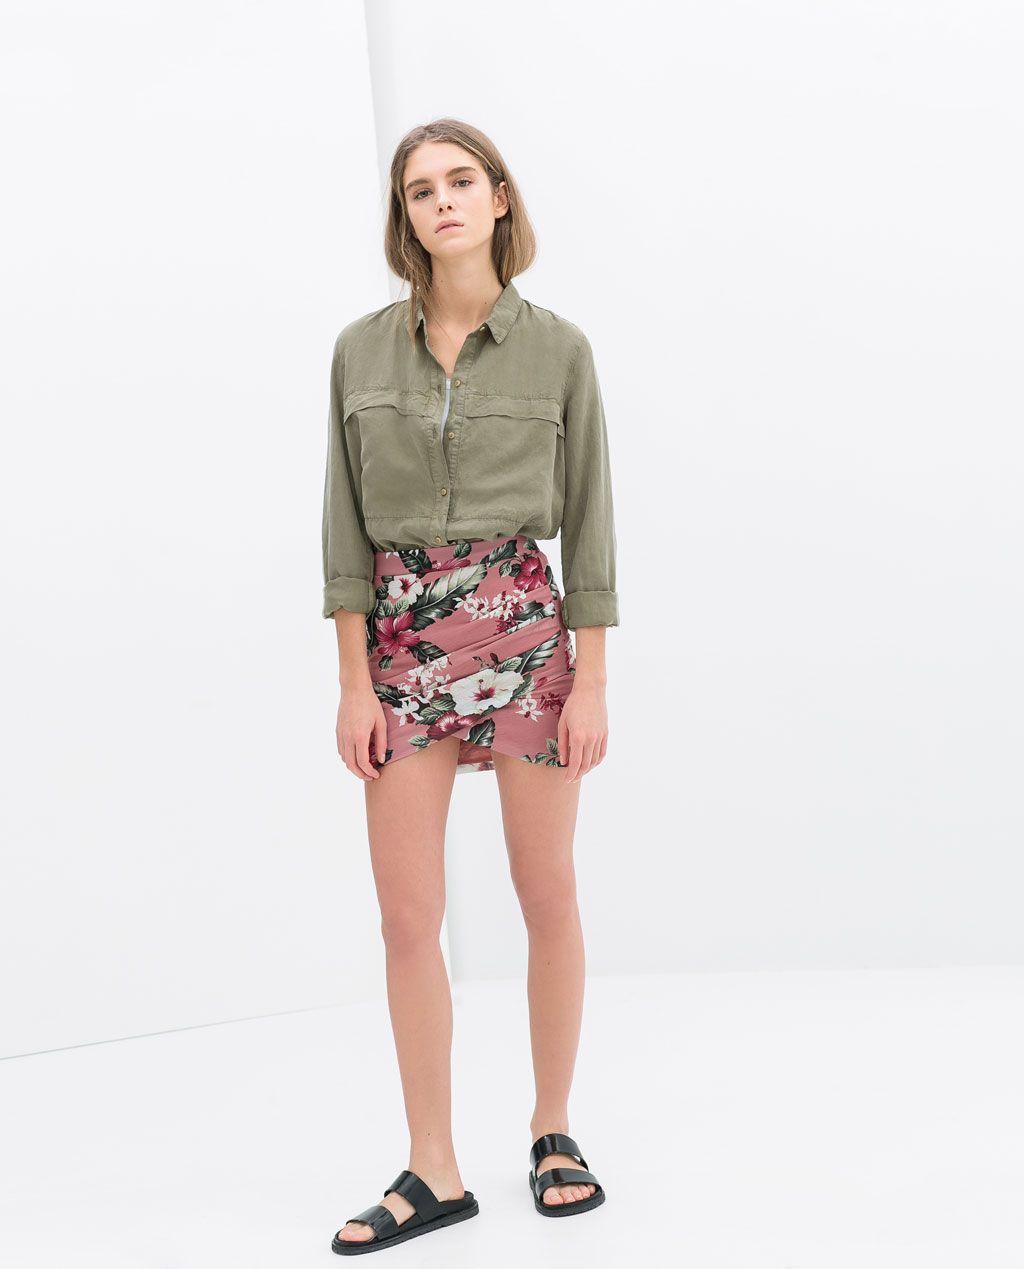 Jupe Drapee Jupes Trf Zara Belgique Draped Skirt Womens Skirt Skirts